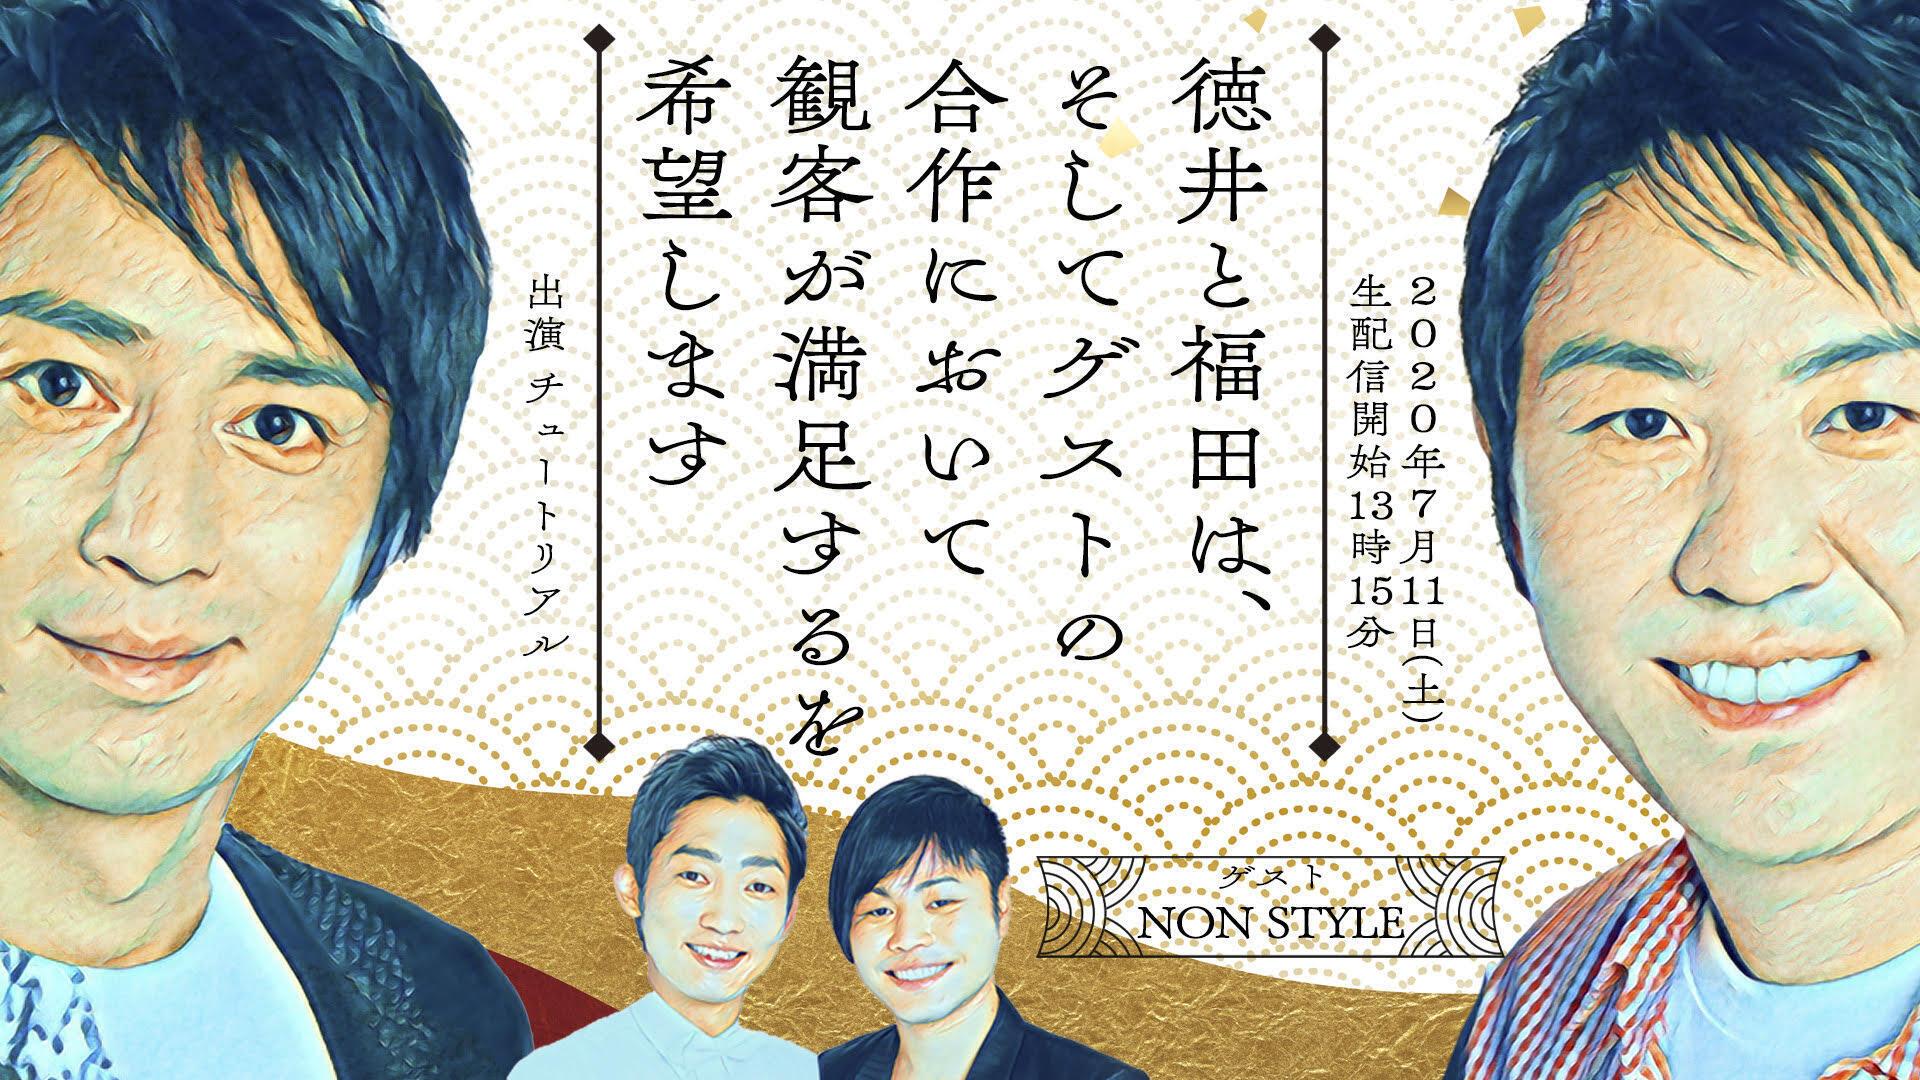 http://www.syumatsu.jp/20200622192123-99aa11a2e5addb3a3628c0c24590fe79191462b3.jpg